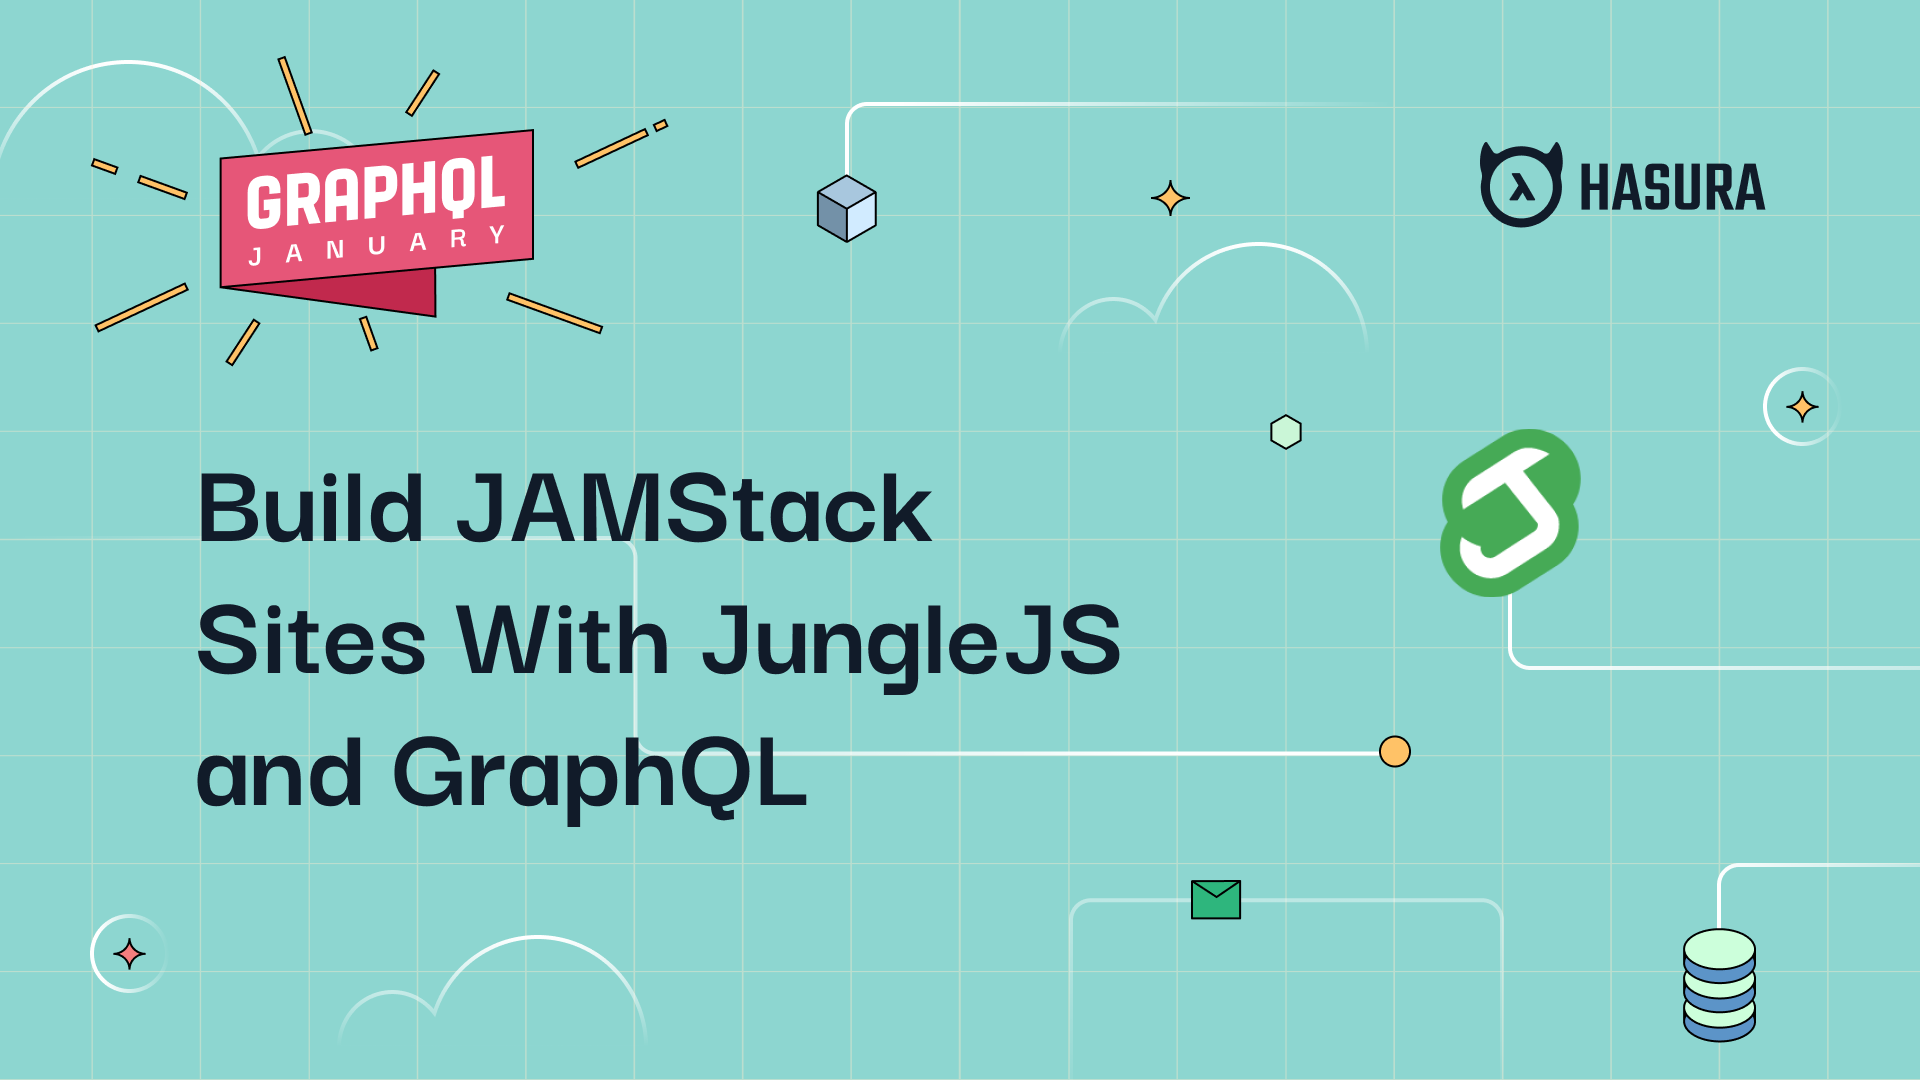 Build JAMStack Sites With JungleJS and GraphQL